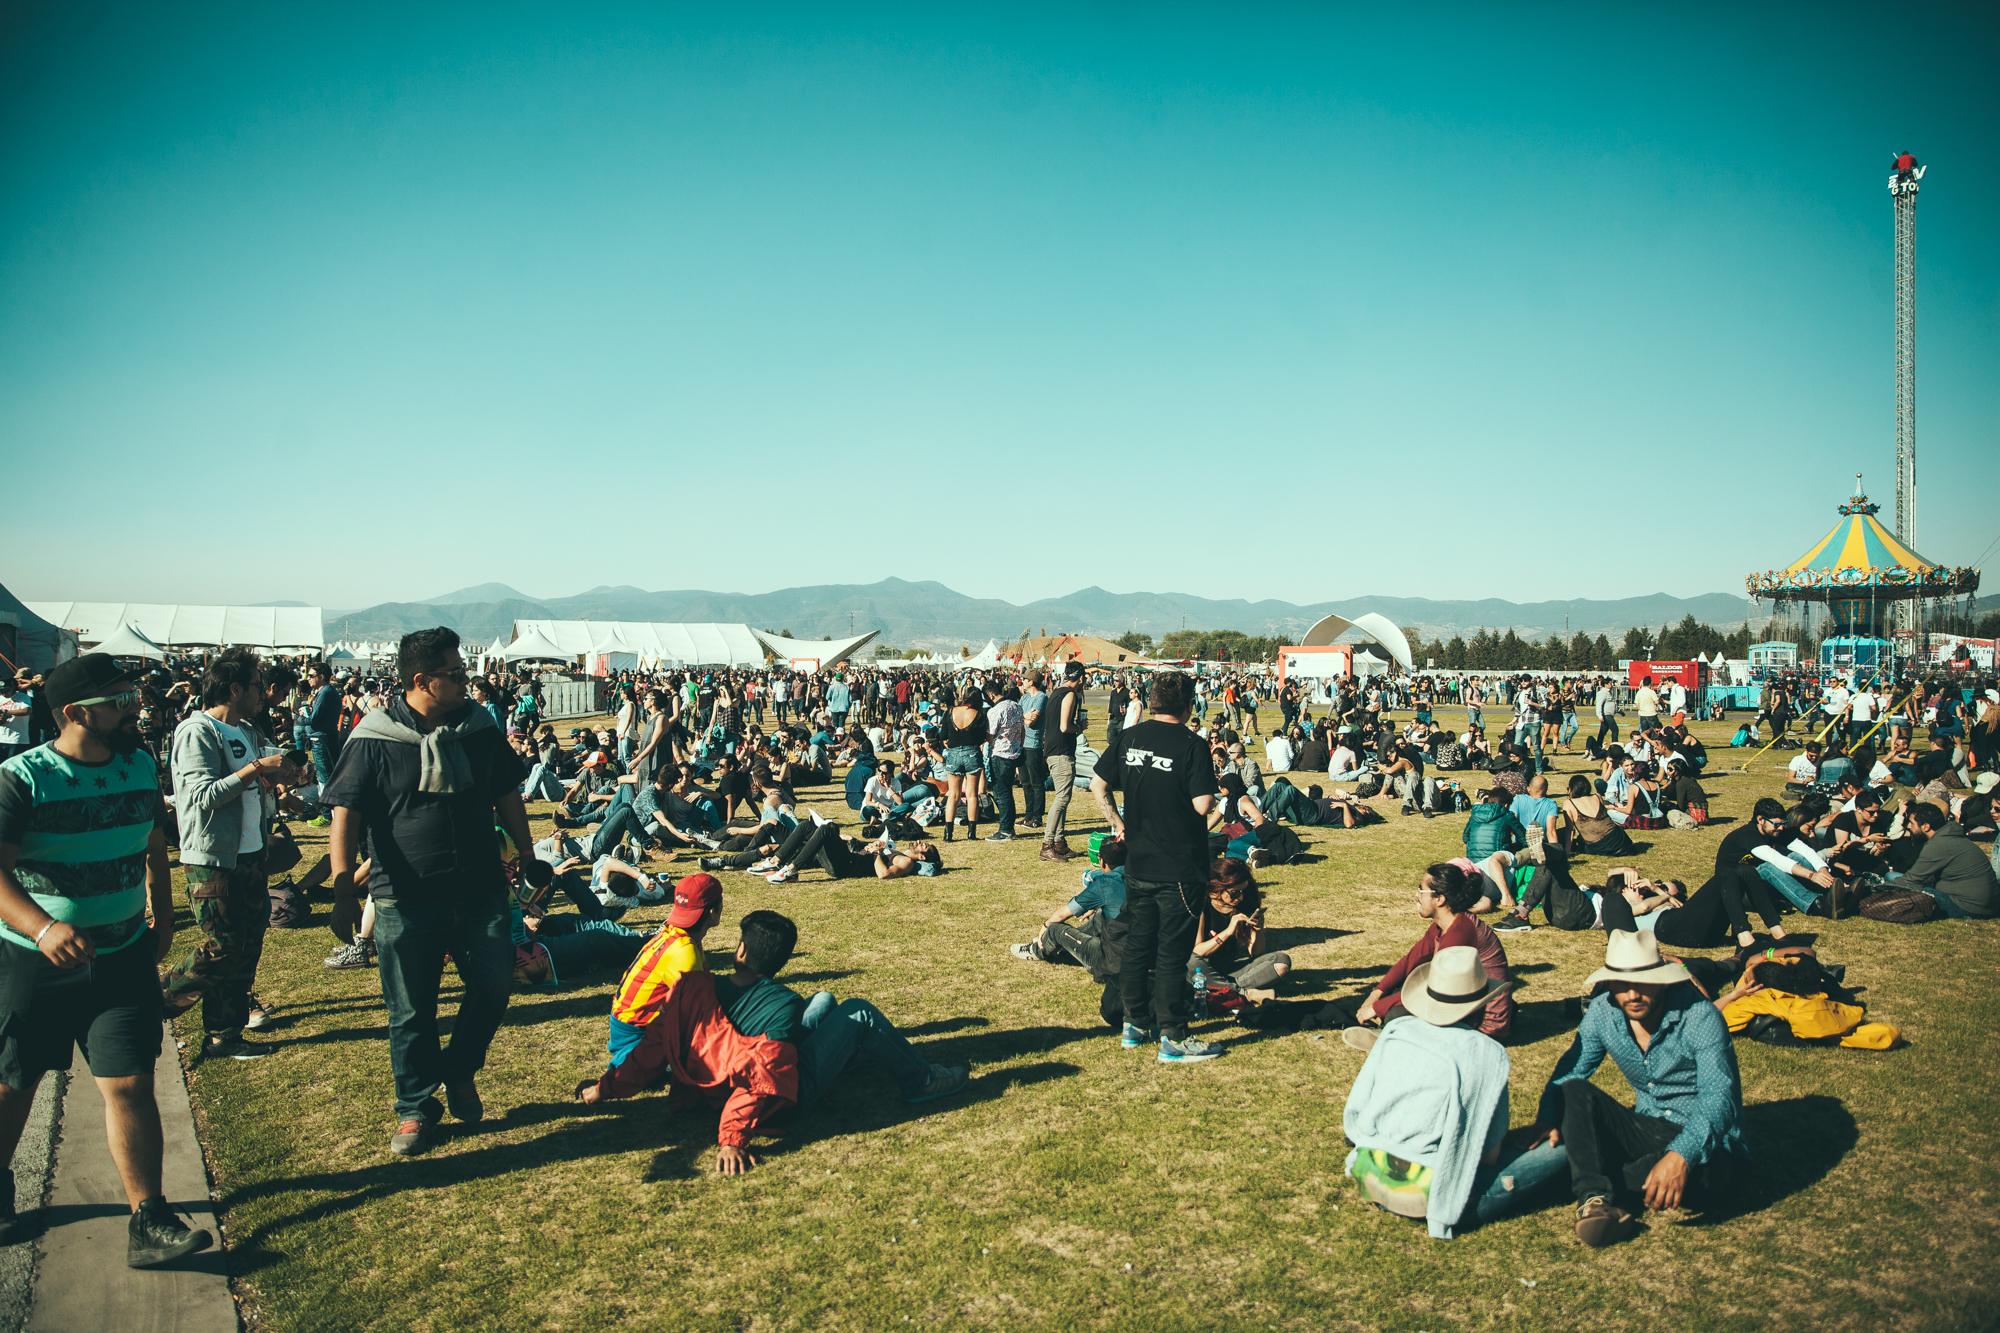 Crowd-Festival Ceremonia-Mexico-Foro Pegaso-04.02.2017-Daniel Patlan_Desde 1989 (11 of 49).jpg